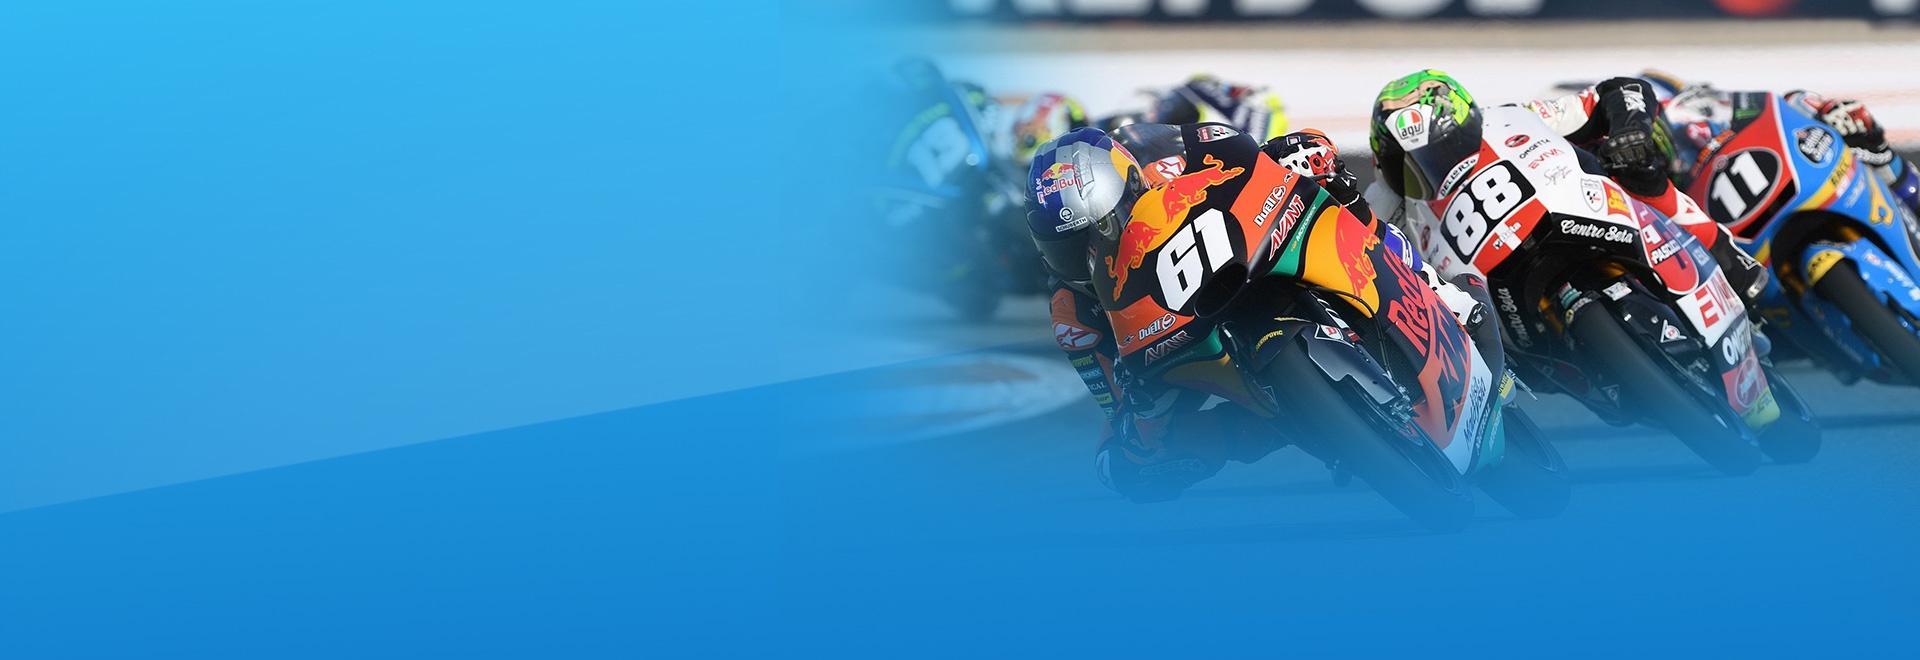 GP Catalunya: Moto2